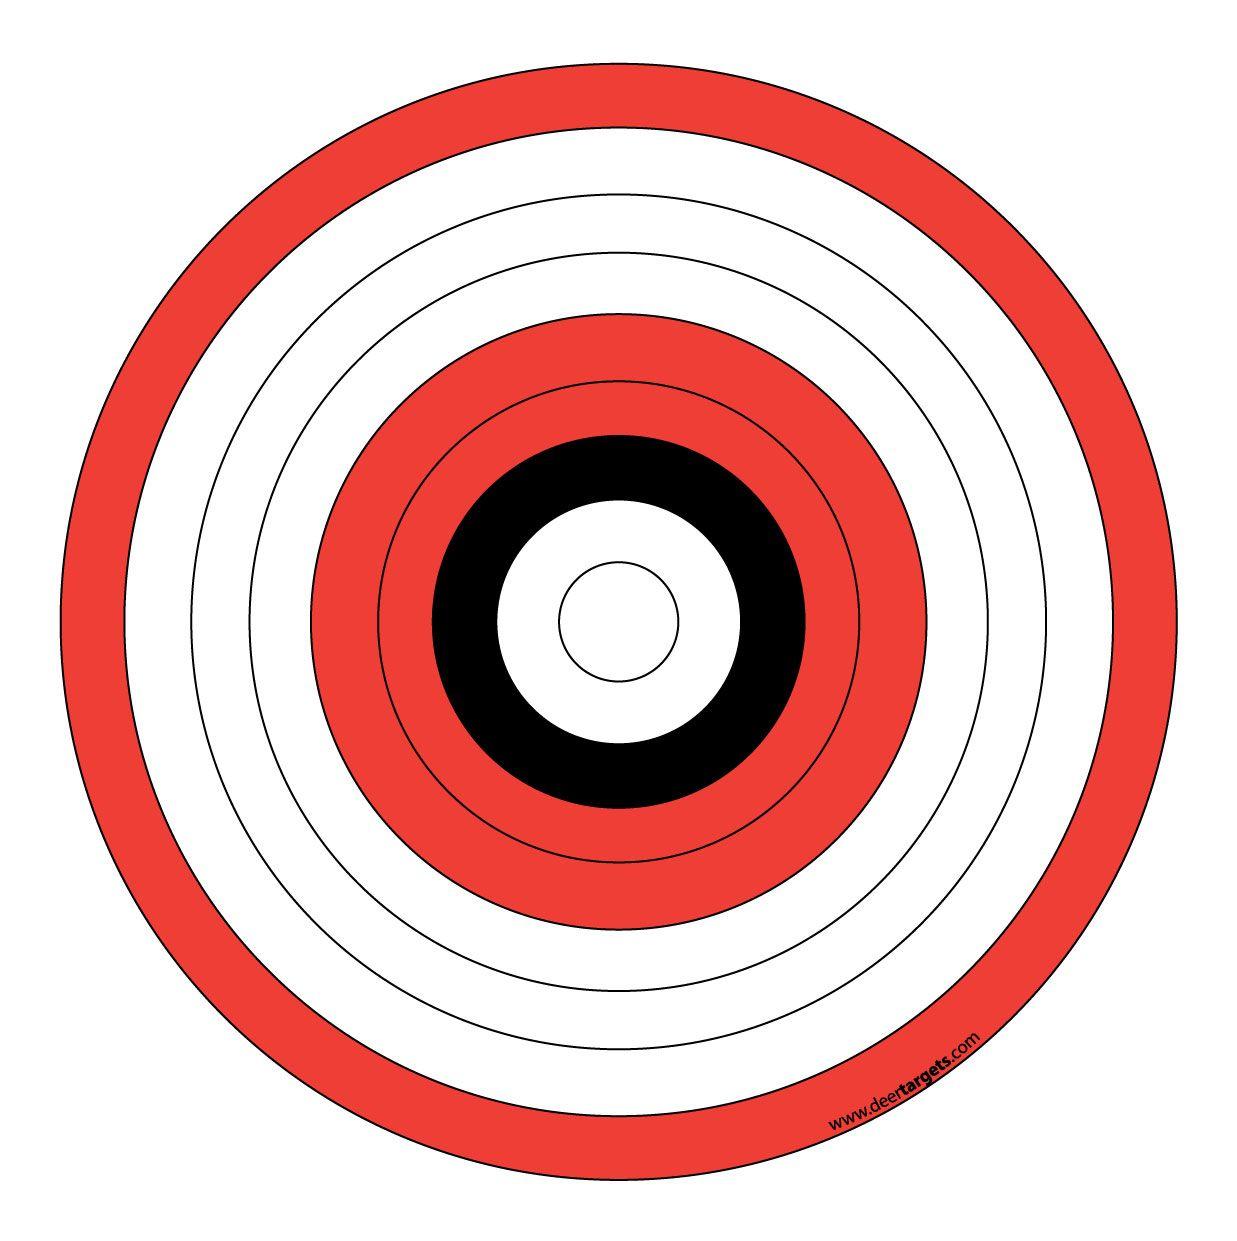 Printable Archery Targets   Archery - Target & Stands   Diy Archery - Free Printable Targets For Shooting Practice